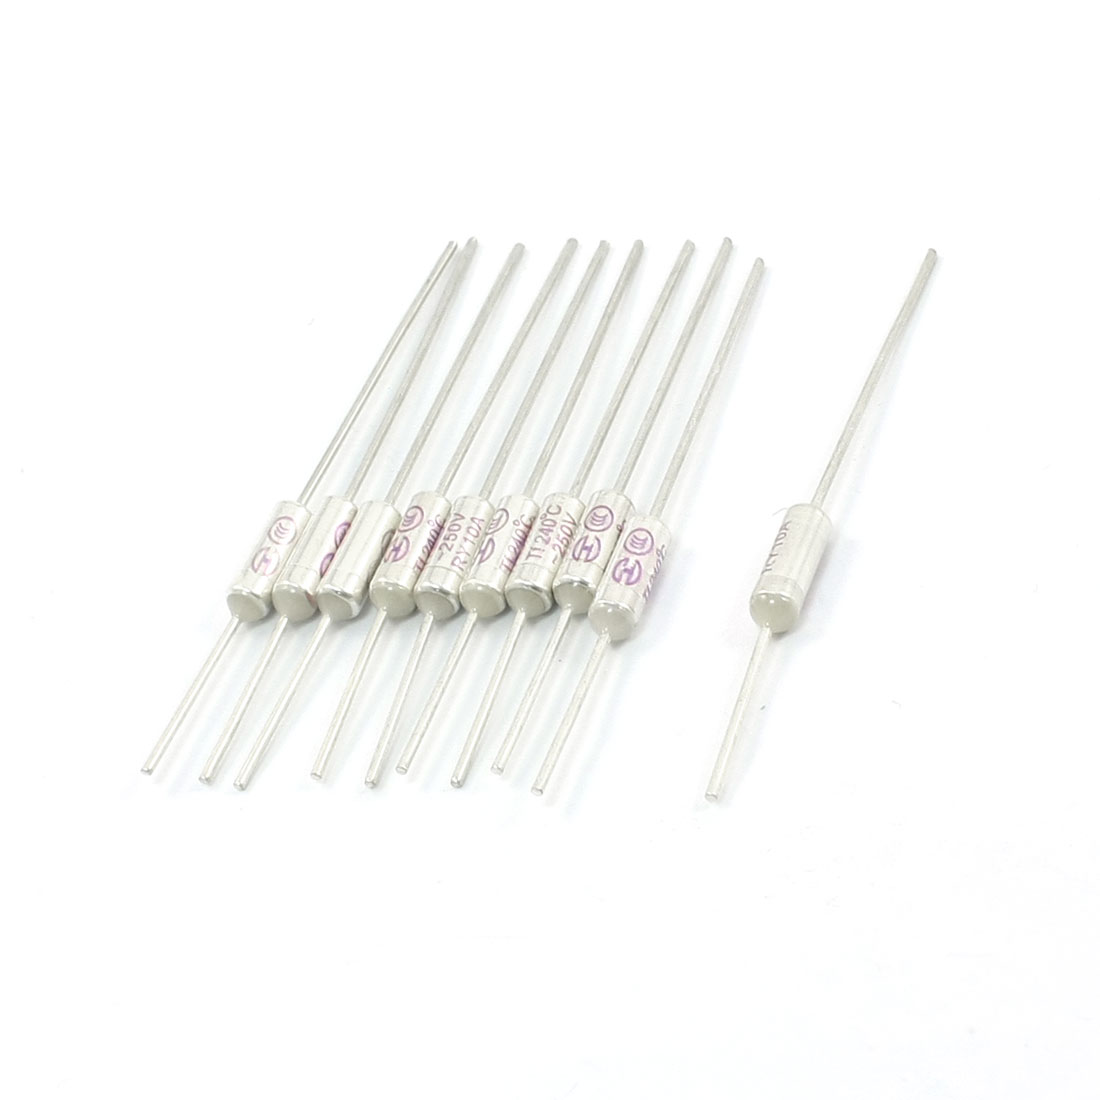 10Pcs-Circuit-Protection-Aluminum-Thermal-Fuse-240C-Degree-250V-10A